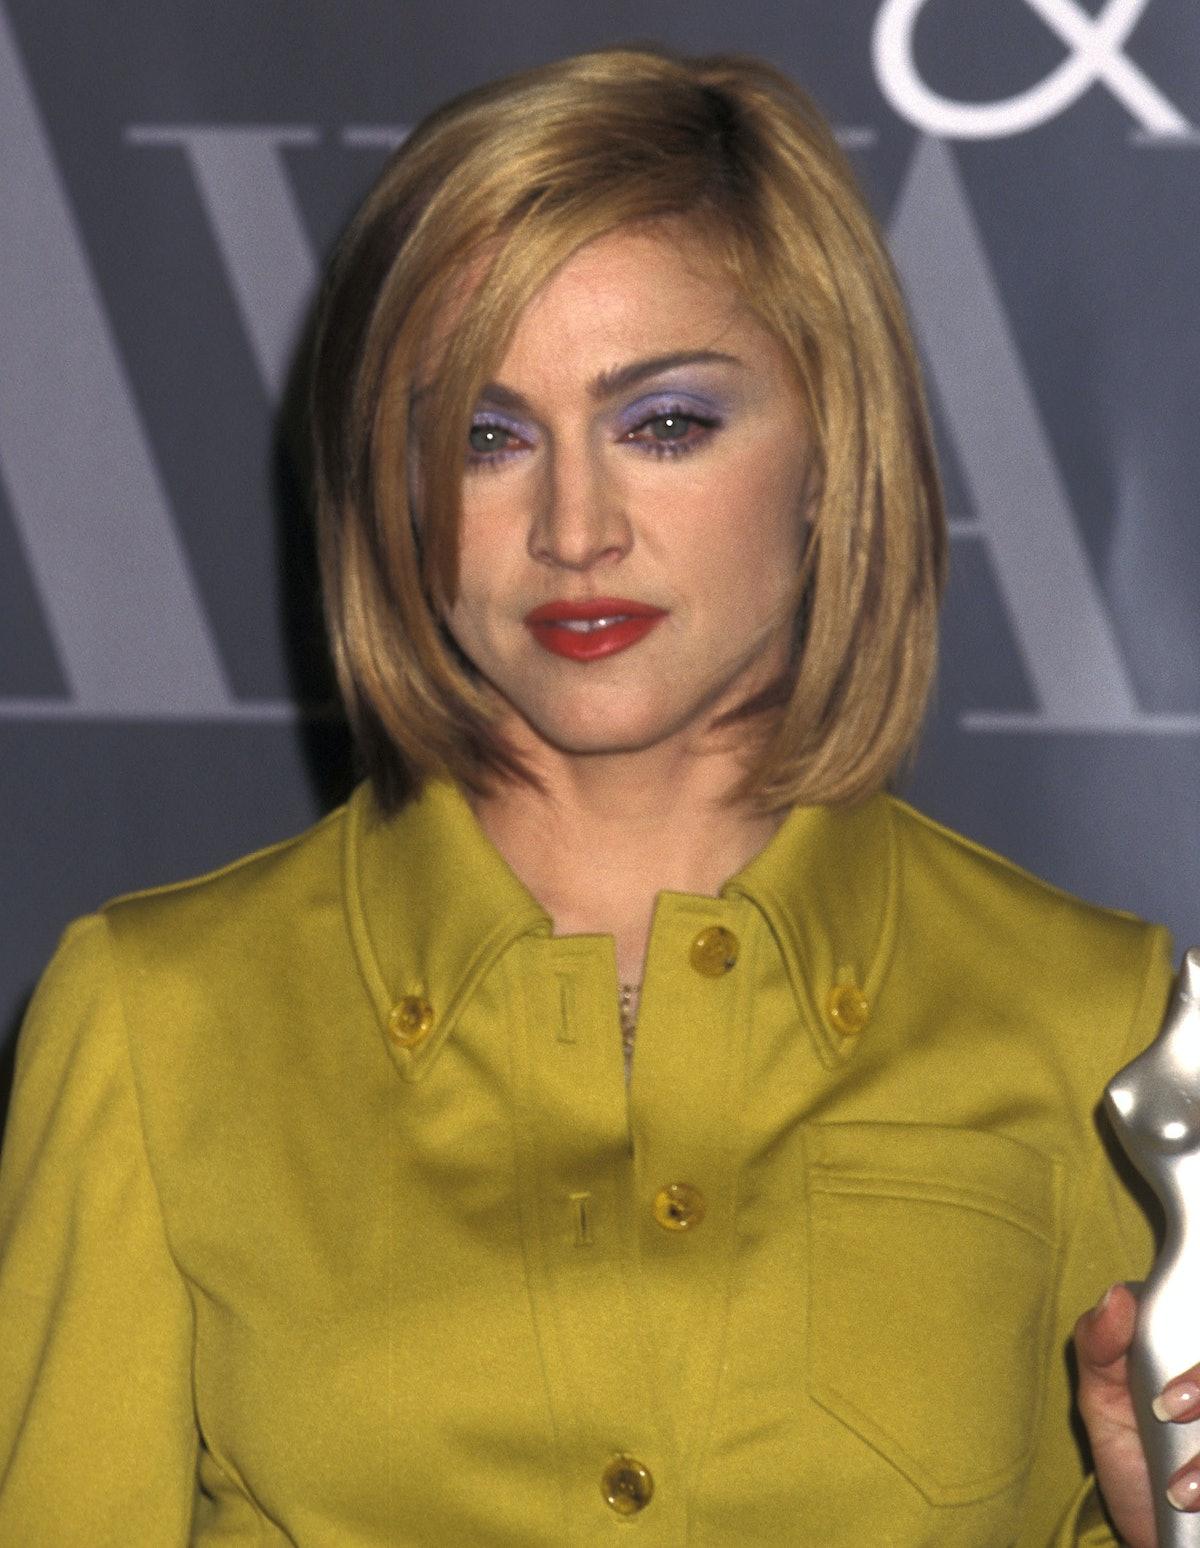 1995: Madonna